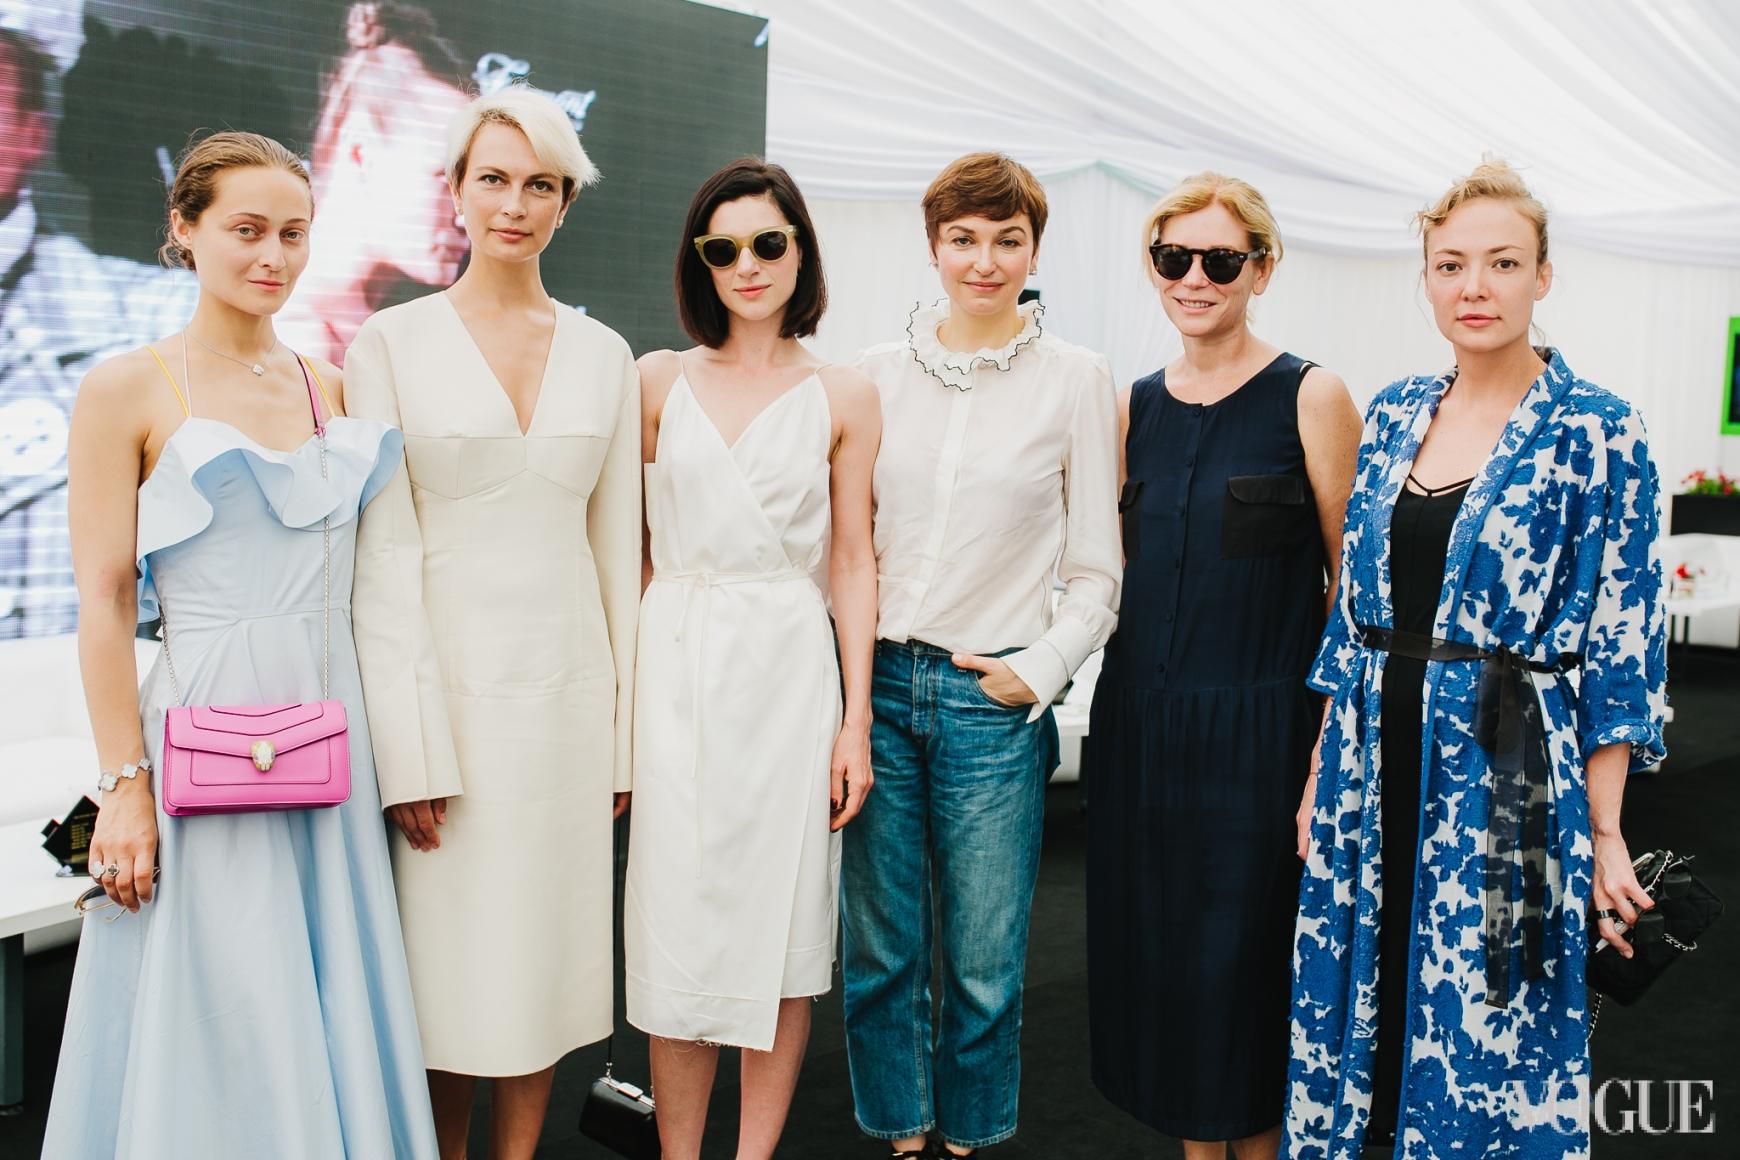 Дарья Шаповалова, Маша Цуканова, Светлана Бевза, Карина Добротворская, Лилия Пустовит и Маша Бех